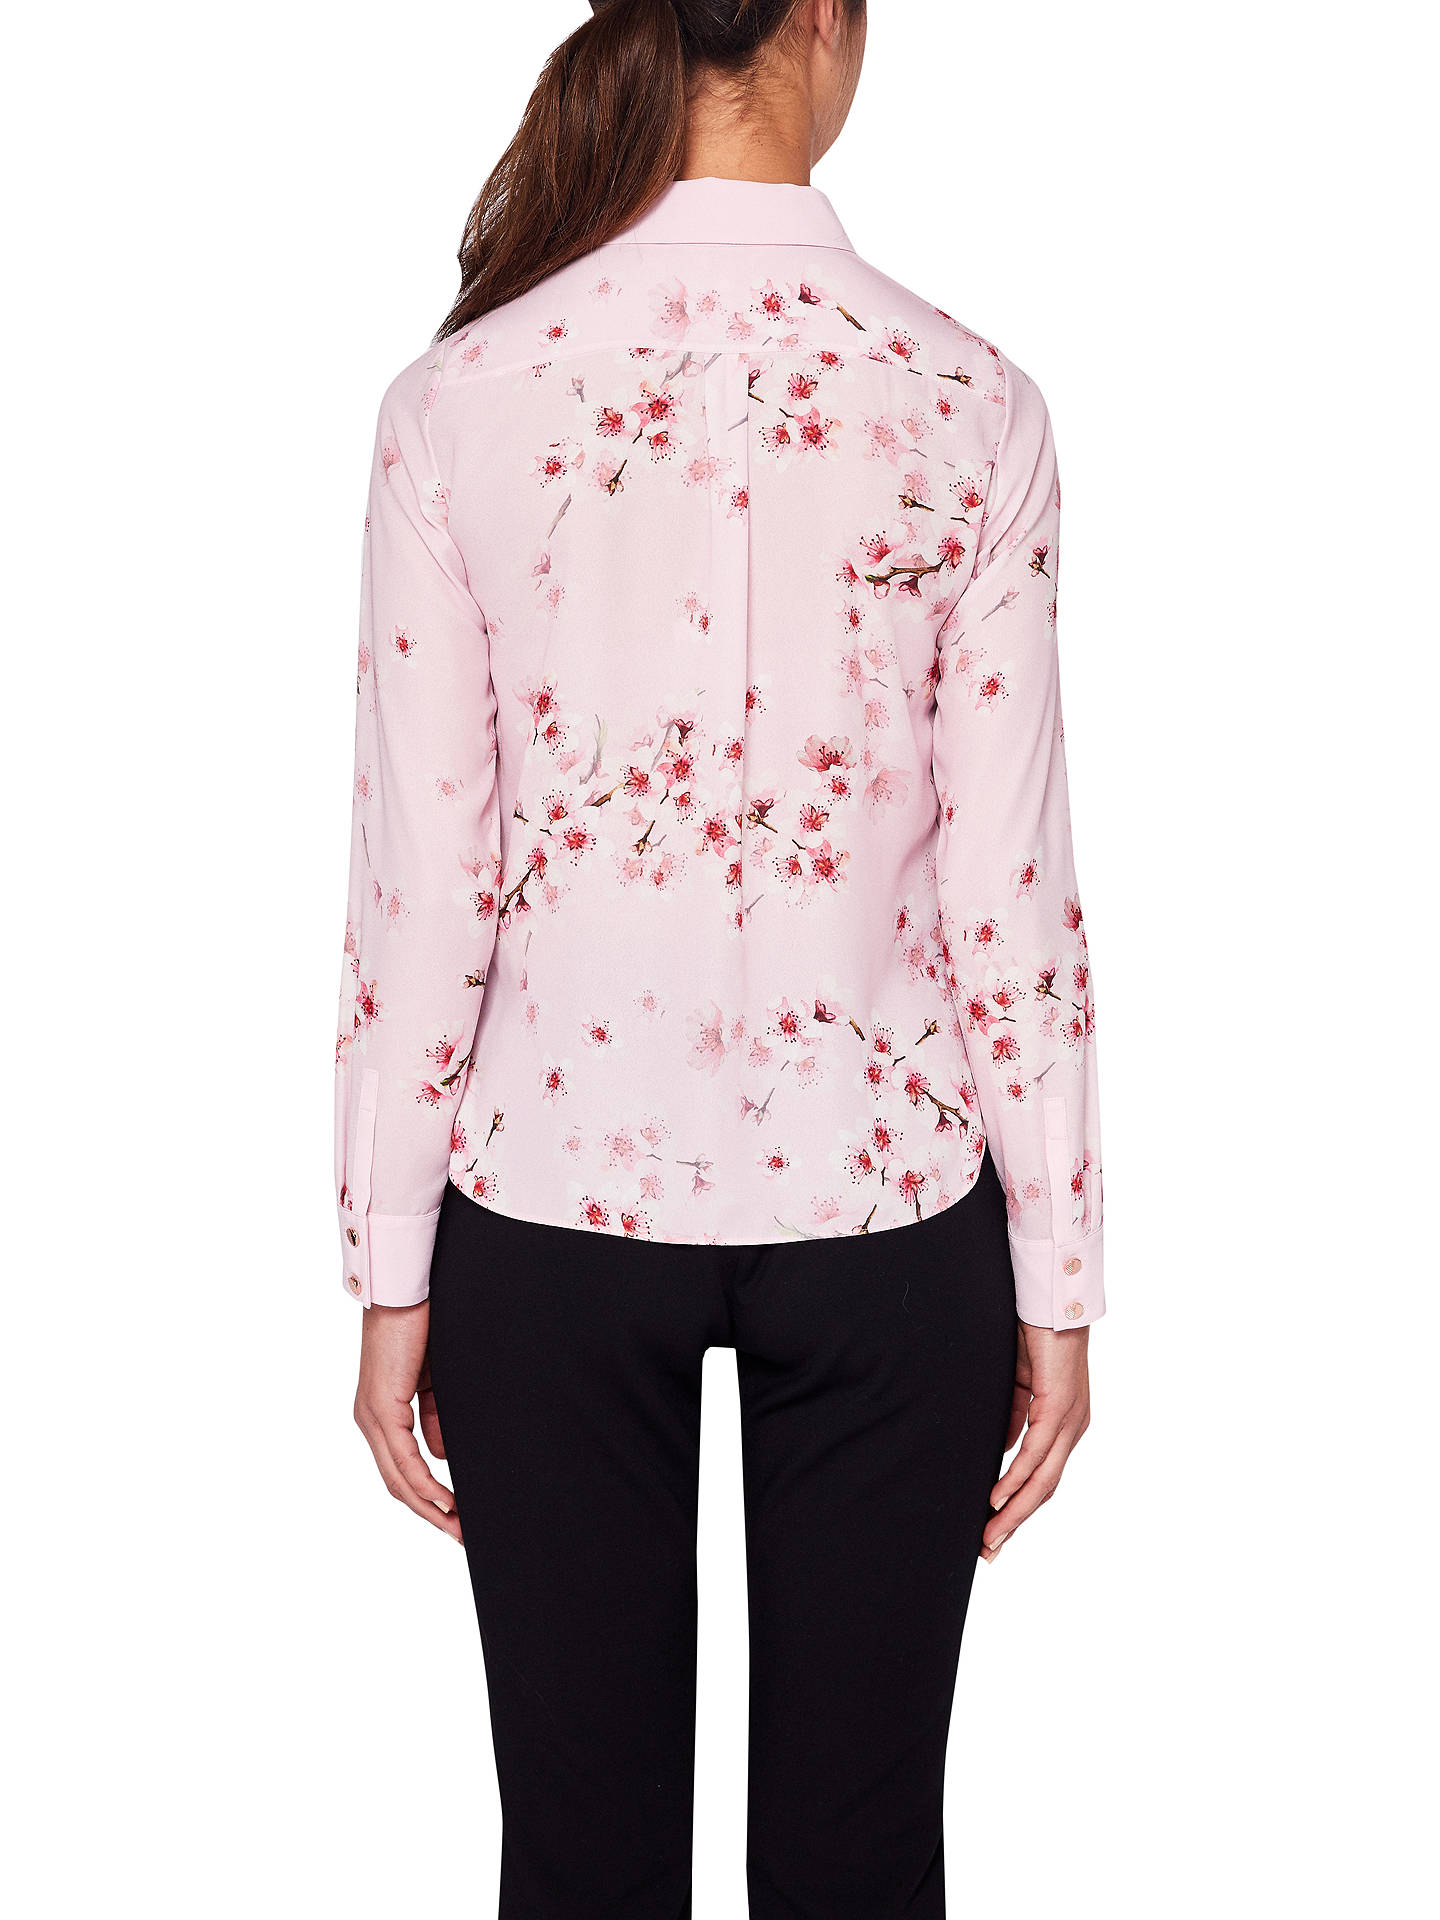 1aa0b9f87 ... Buy Ted Baker Atterba Blossom Long Sleeve Shirt